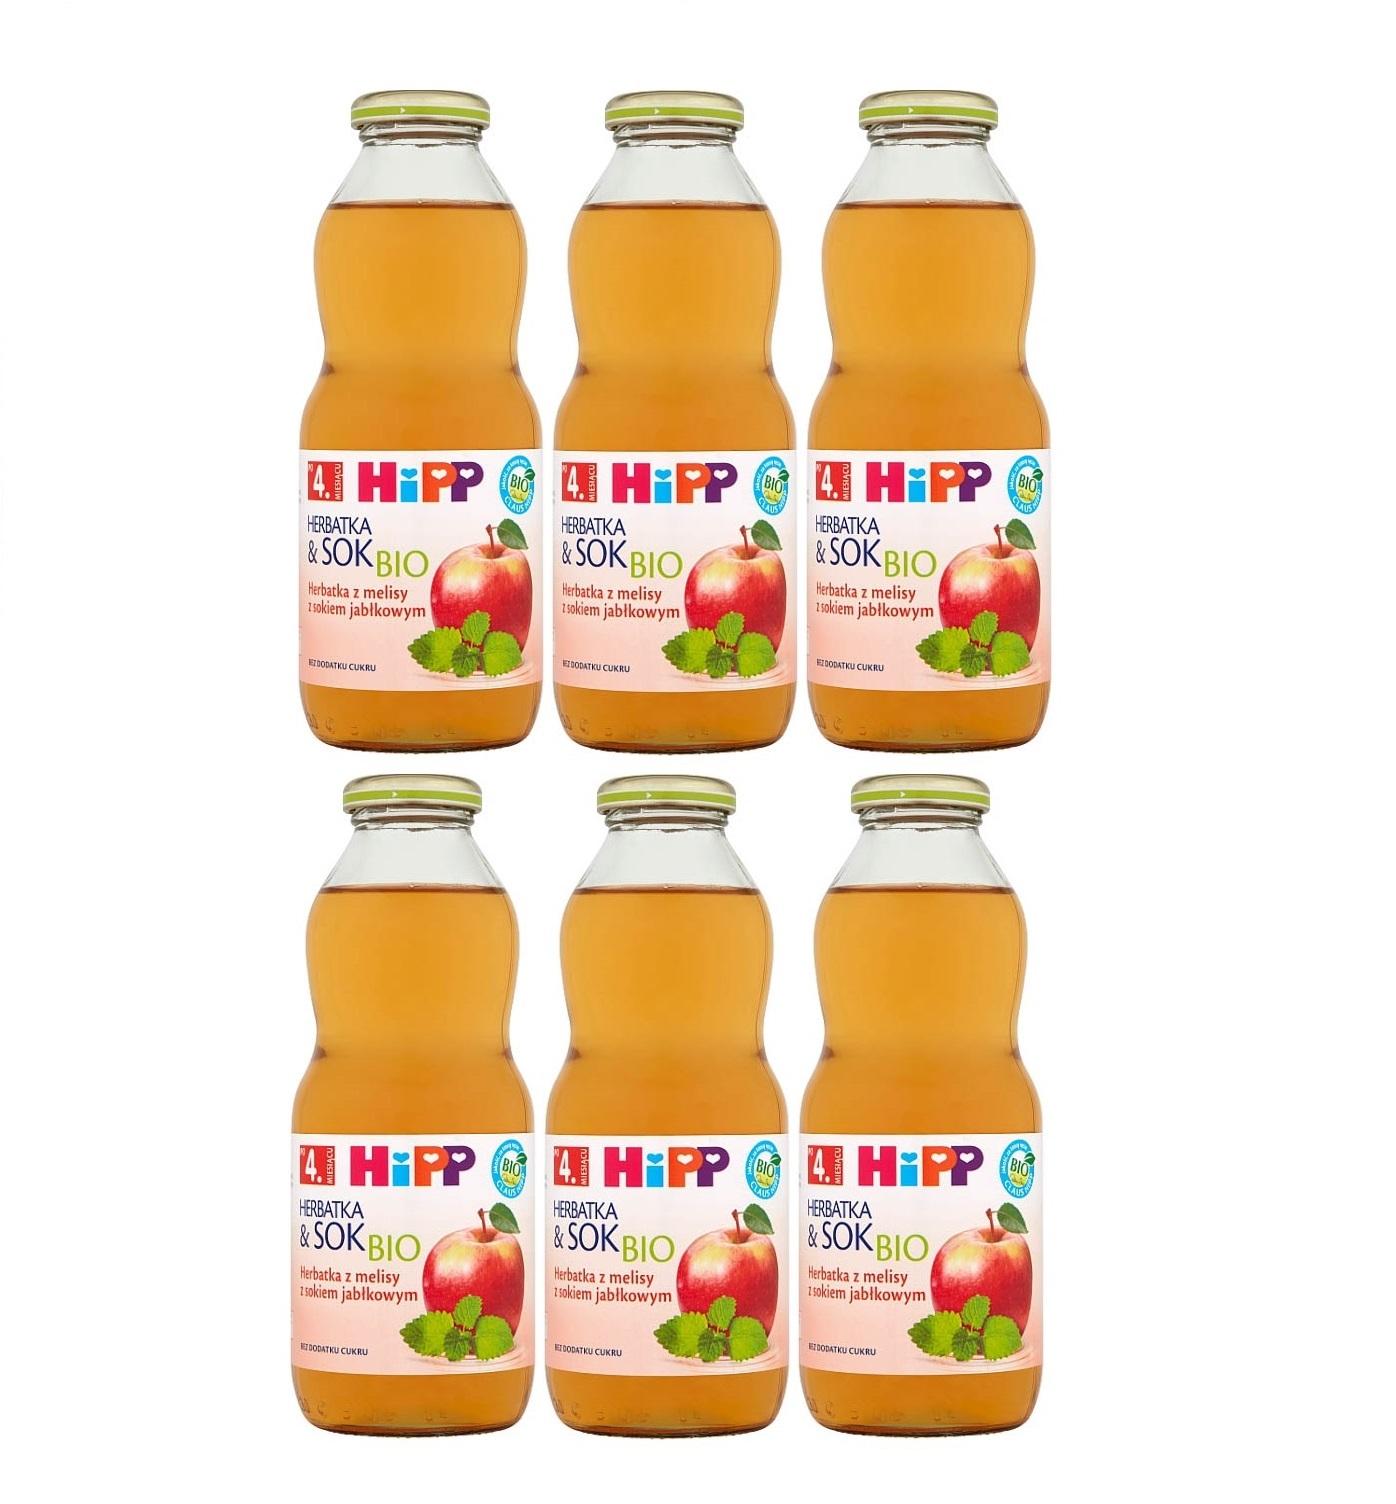 6 pack hipp 500ml herbata&sok melisa z sokiem jablkowym